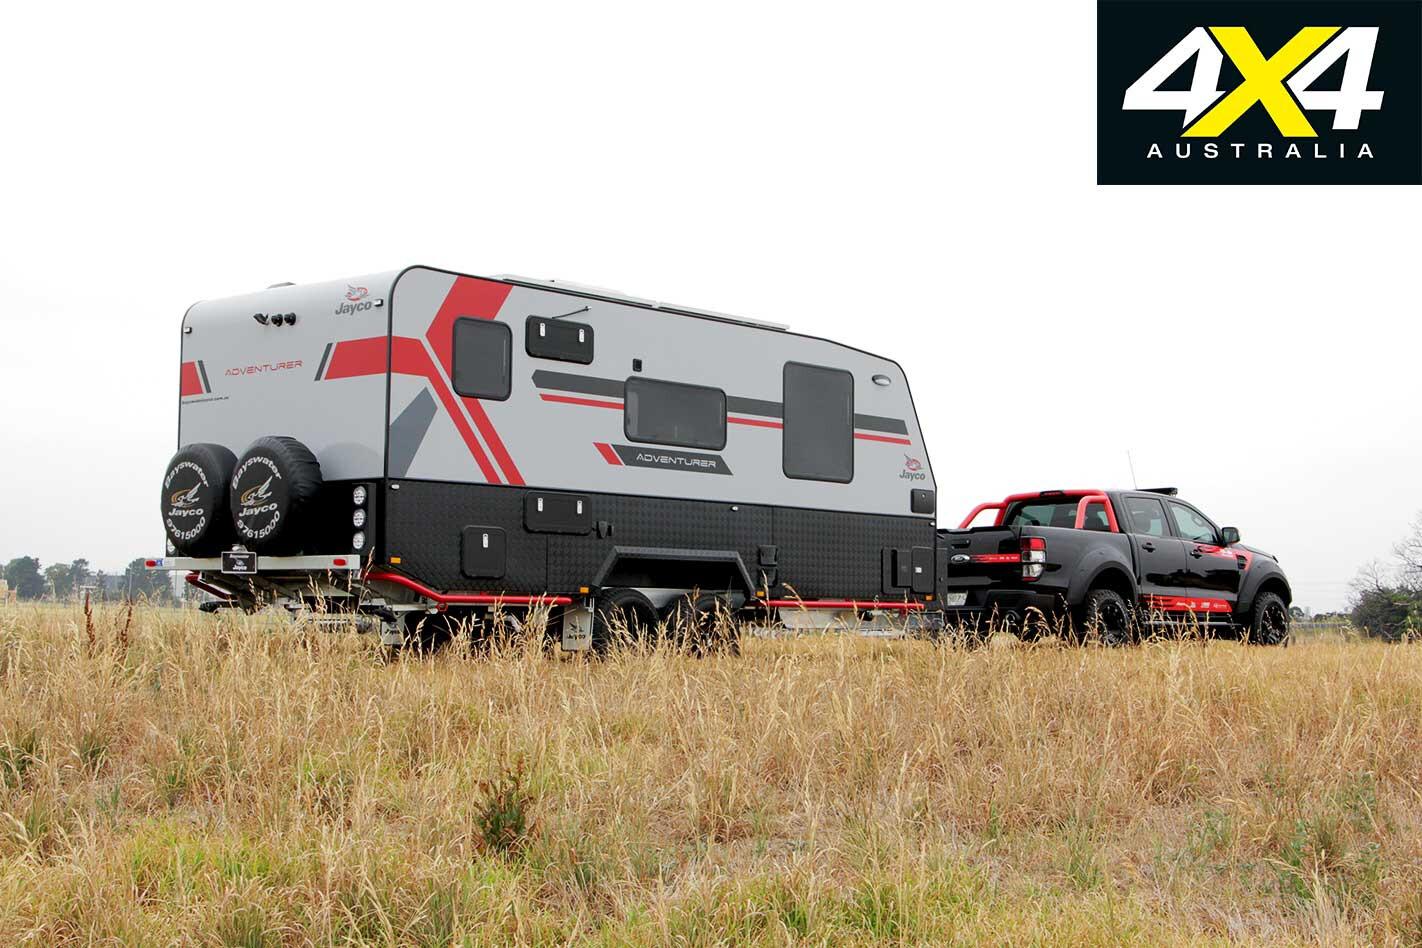 Pedders MS RT Ford Ranger Jayco Adventurer Caravan Setup Jpg